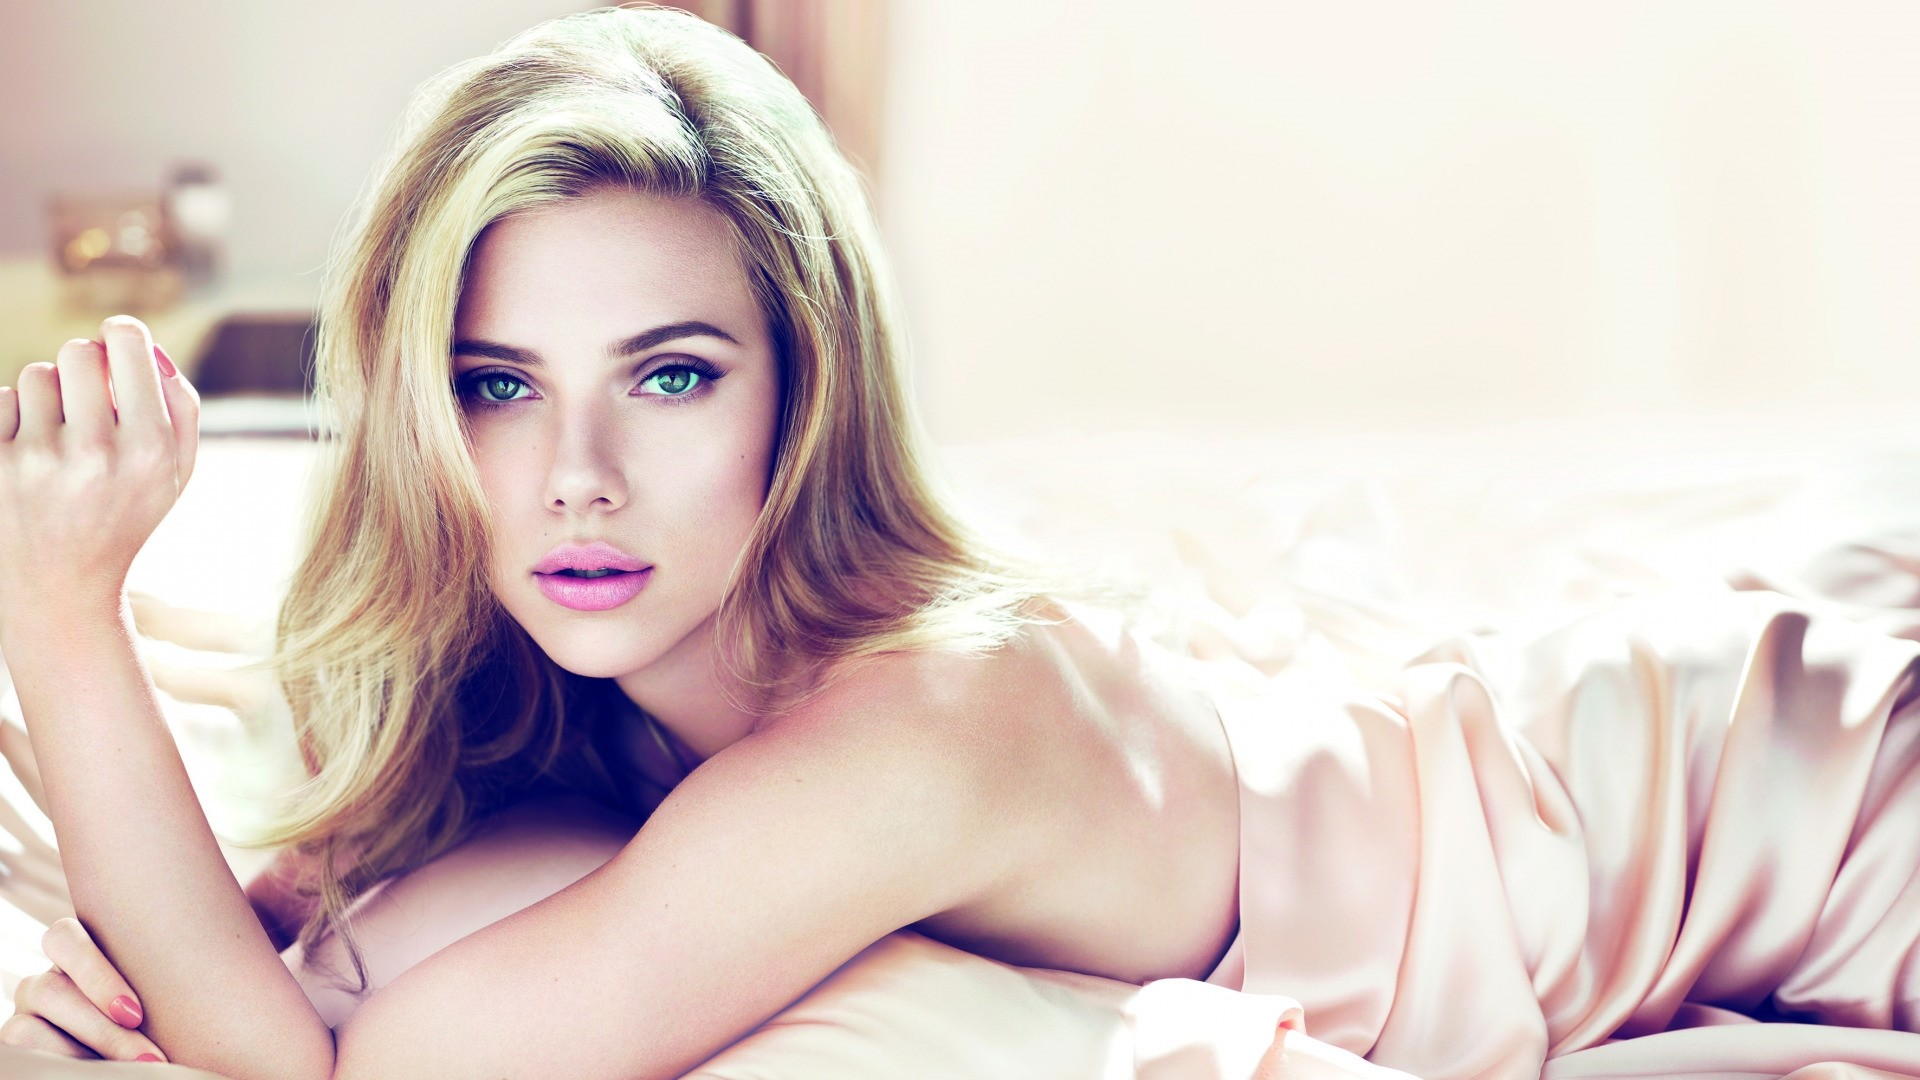 Scarlett Johansson hd wallpaper for pc